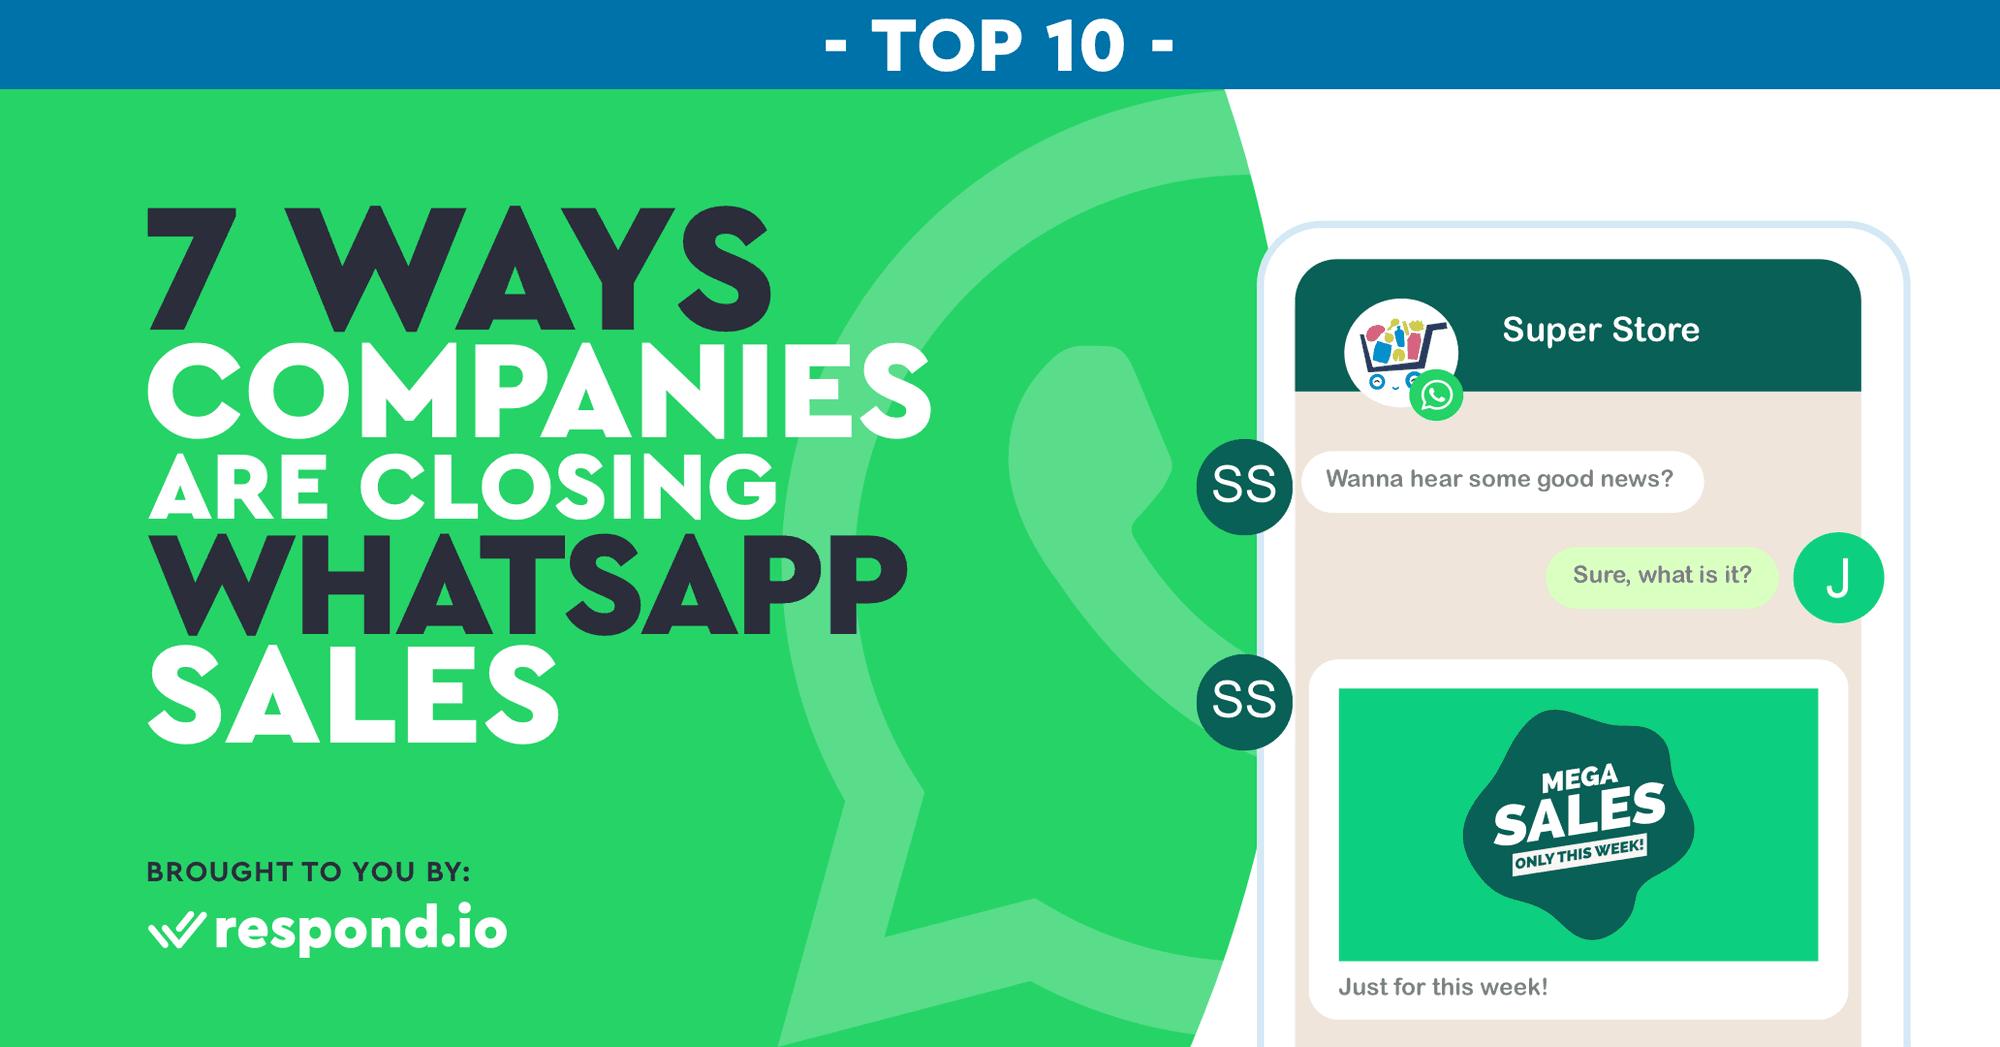 7 Ways Companies Are Closing Whatsapp Sales